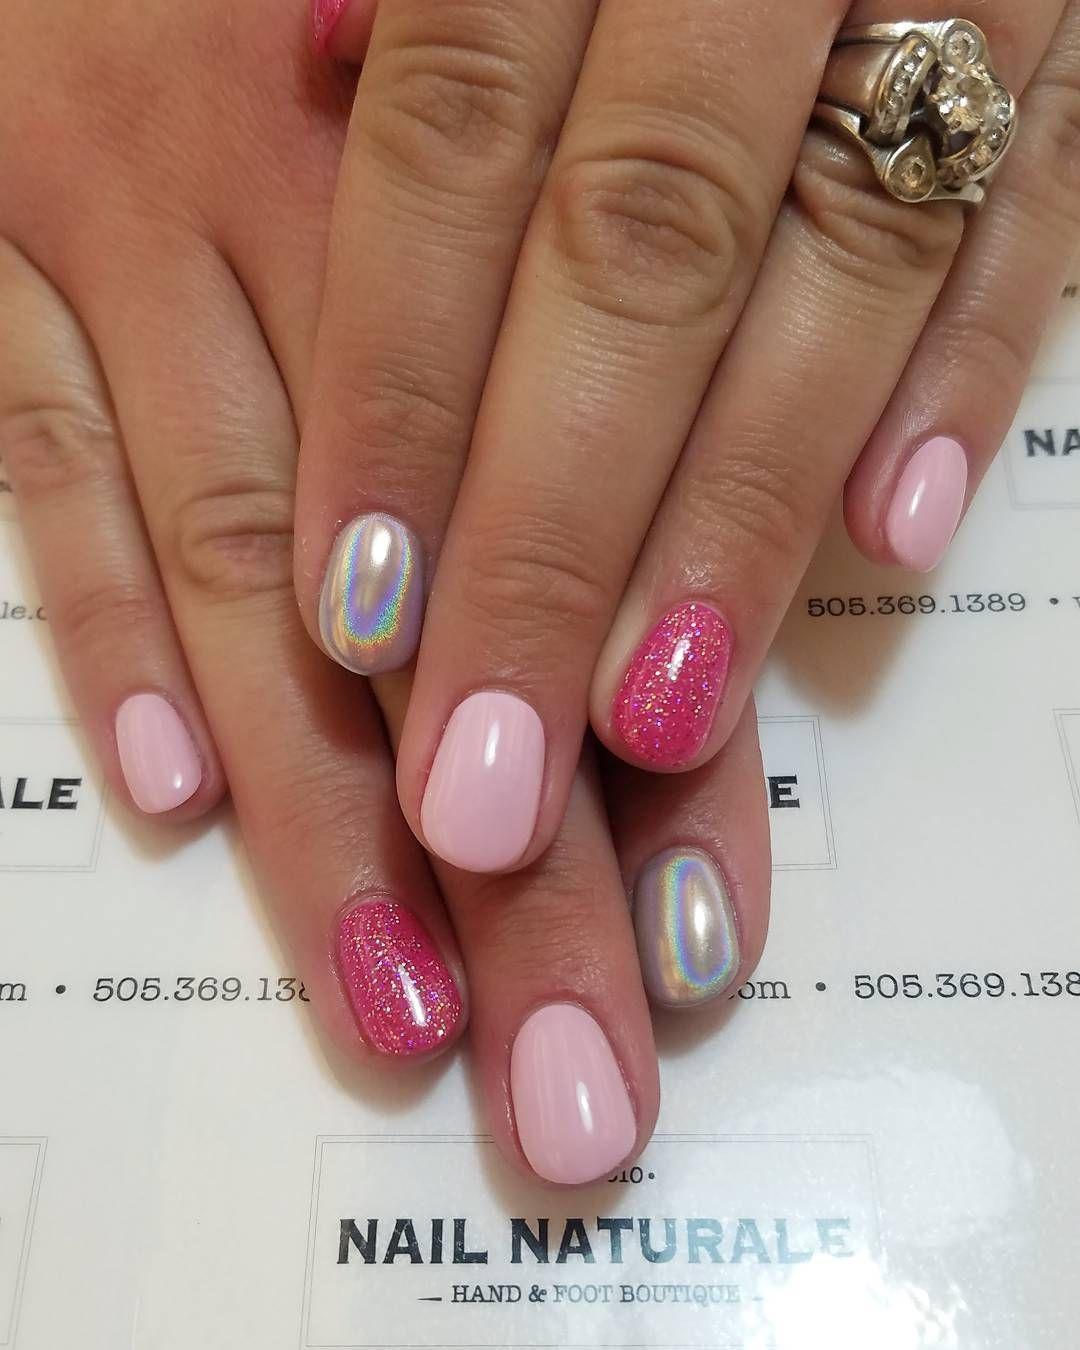 Pin de Lorraine Dunne en nails | Pinterest | Creatividad